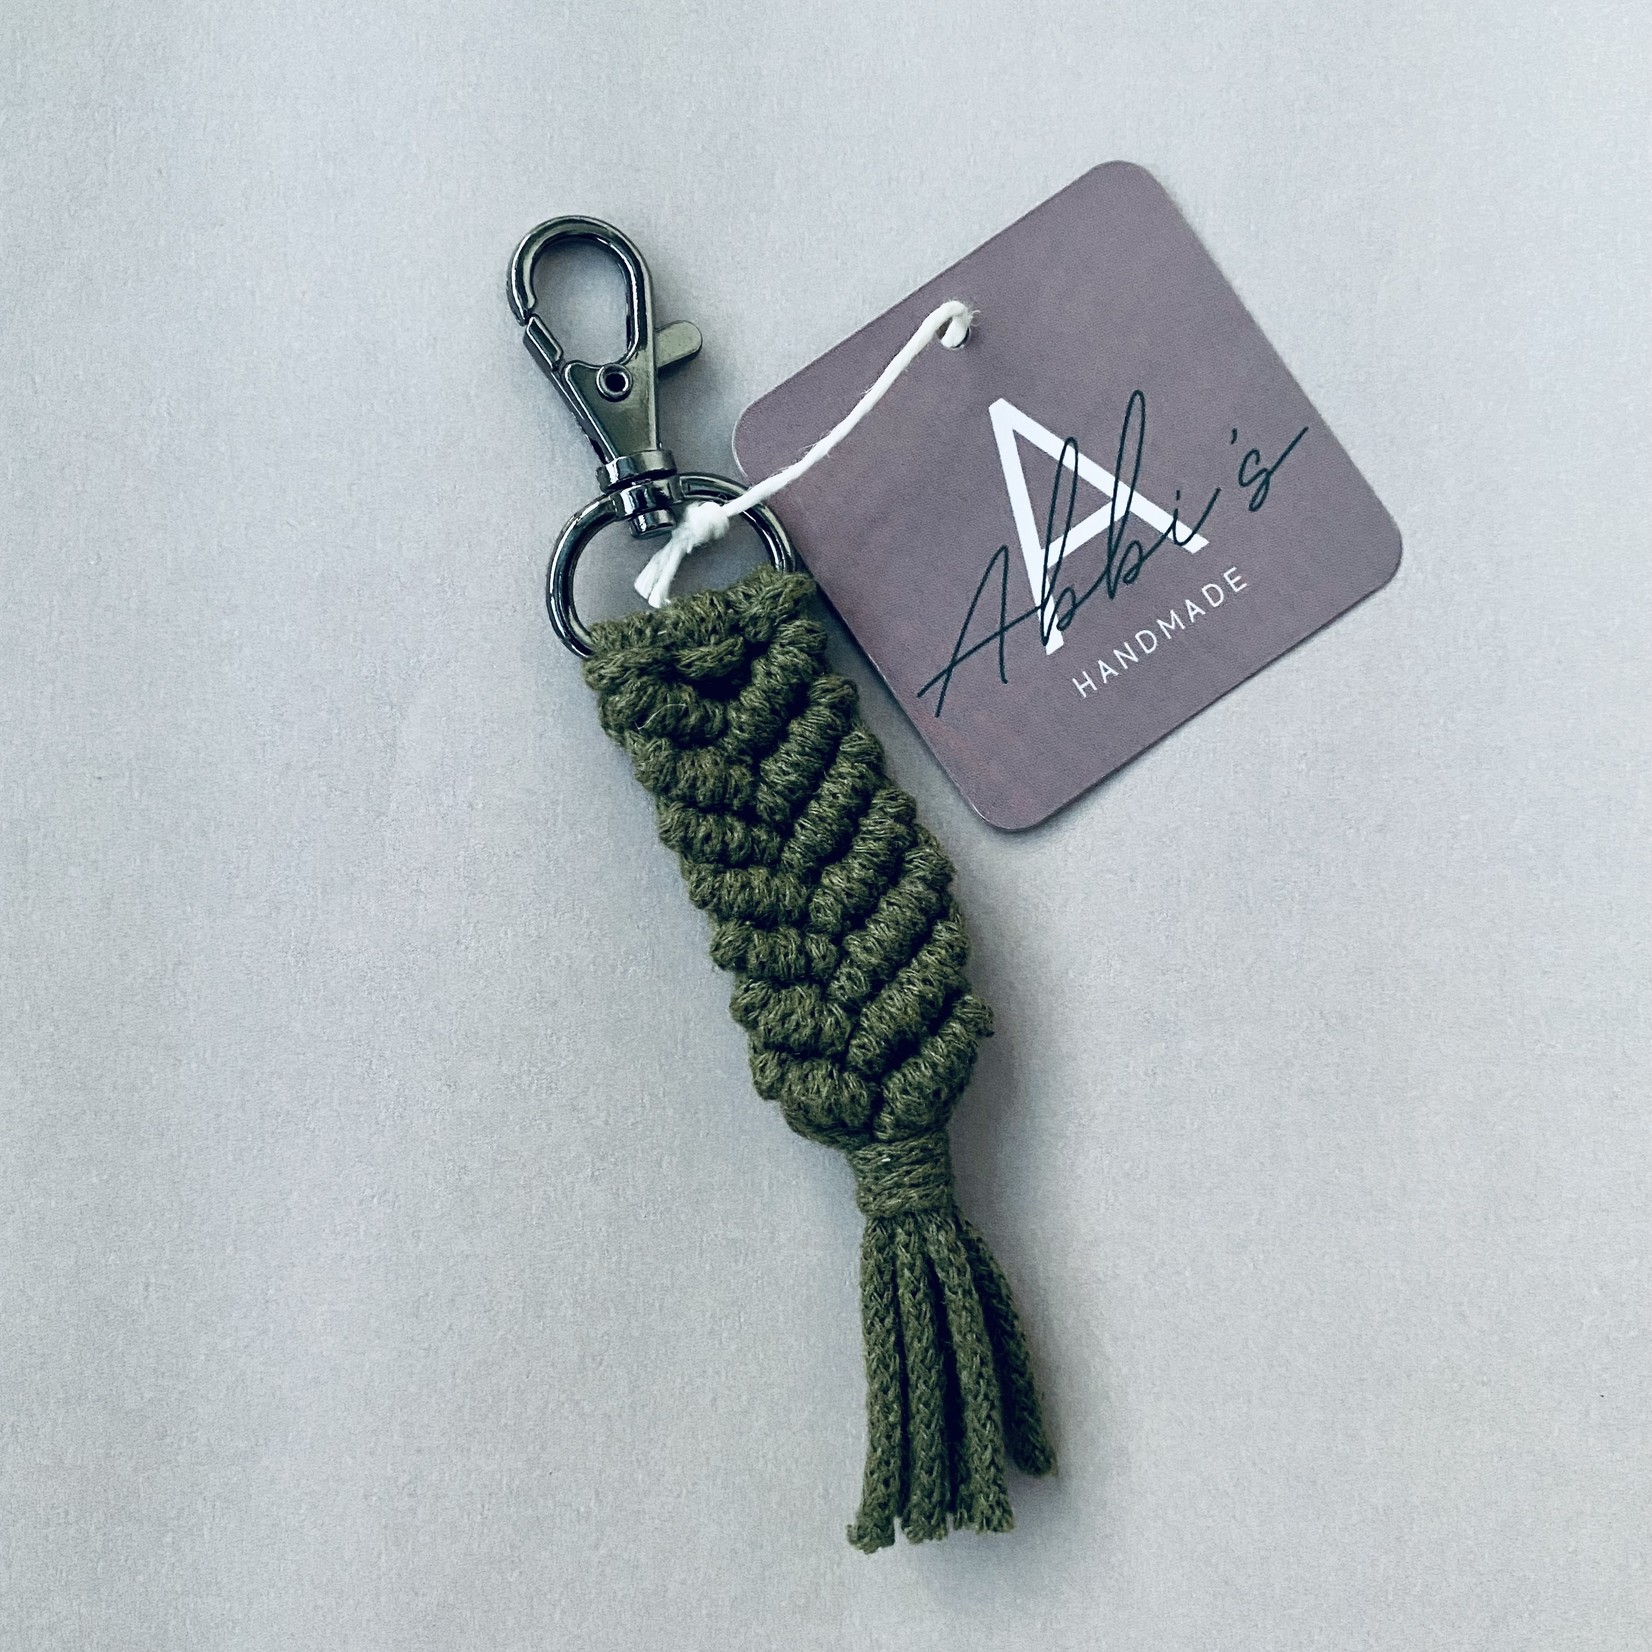 Abbi's Handmade Abbi's Handmade   Keychain Liam - Avocado